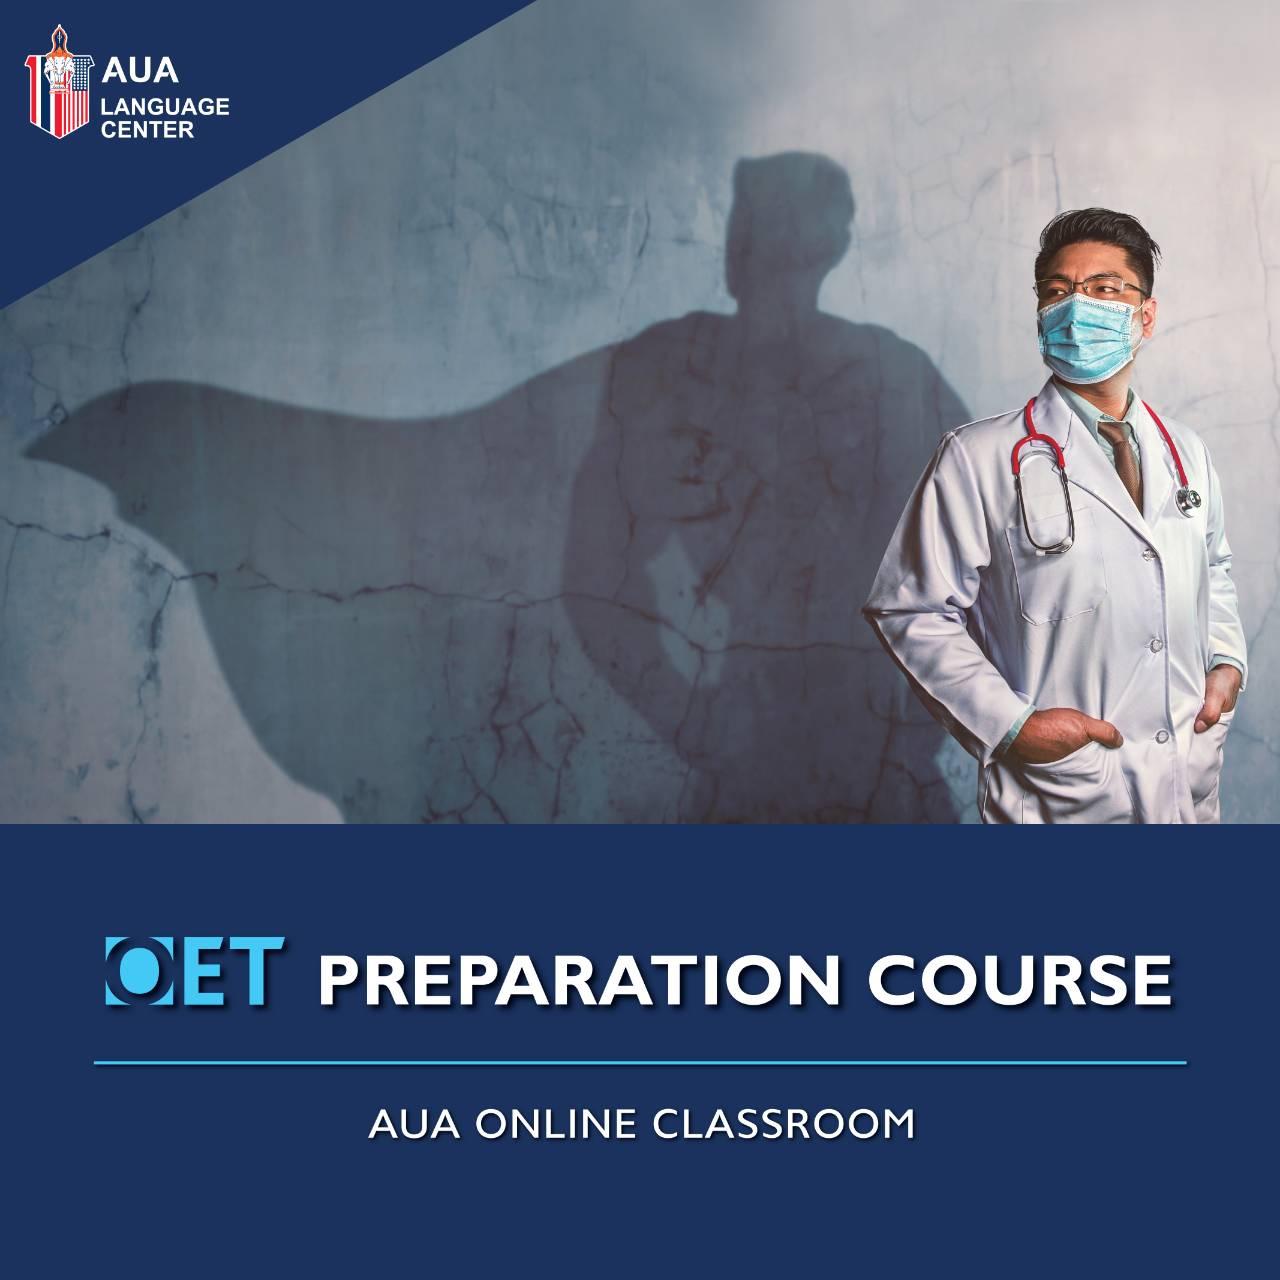 OET Preparation course